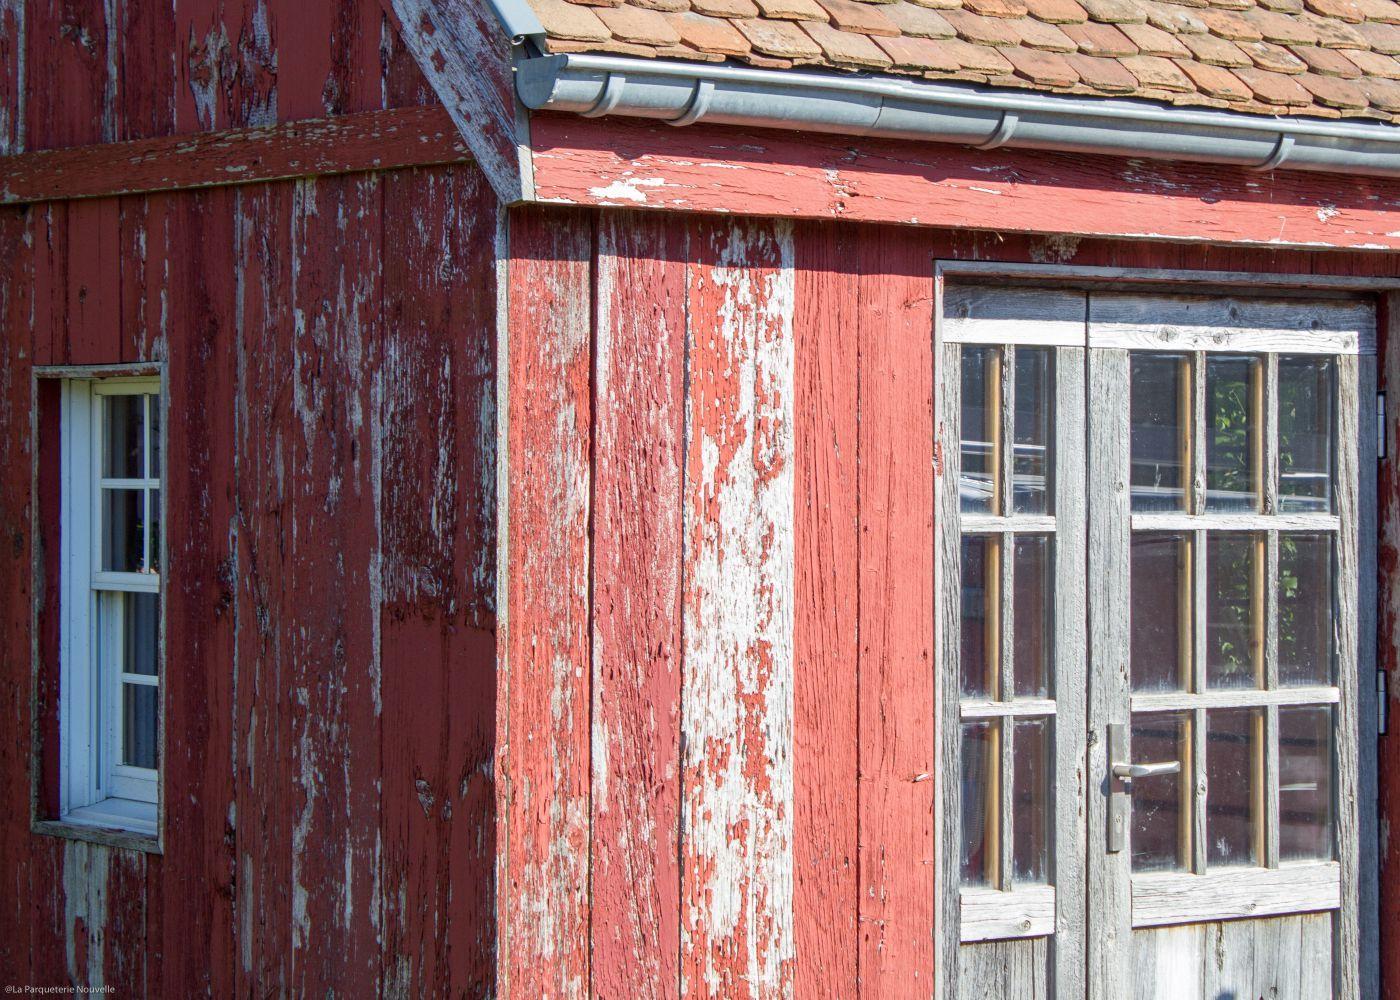 bardage vieux bois bardage bois us rouge soutenu peinture d 39 origine bardage vieux bois et. Black Bedroom Furniture Sets. Home Design Ideas